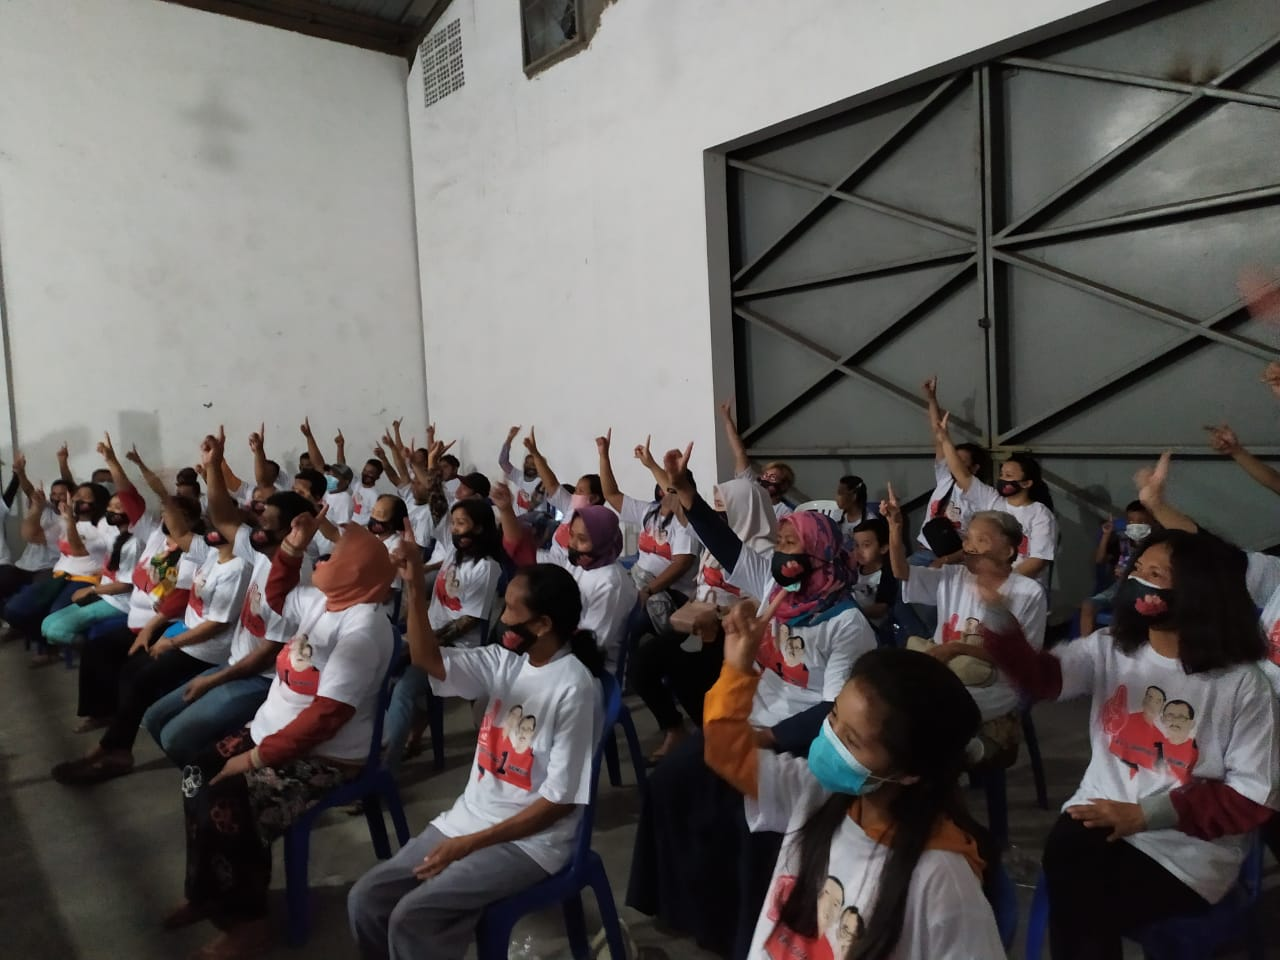 Aliansi Kebangsaan Surabaya bersama Masyarakat Lintas Etnis Surabaya komitmen memenangkan Pasangan No 1 Eri - Armudji